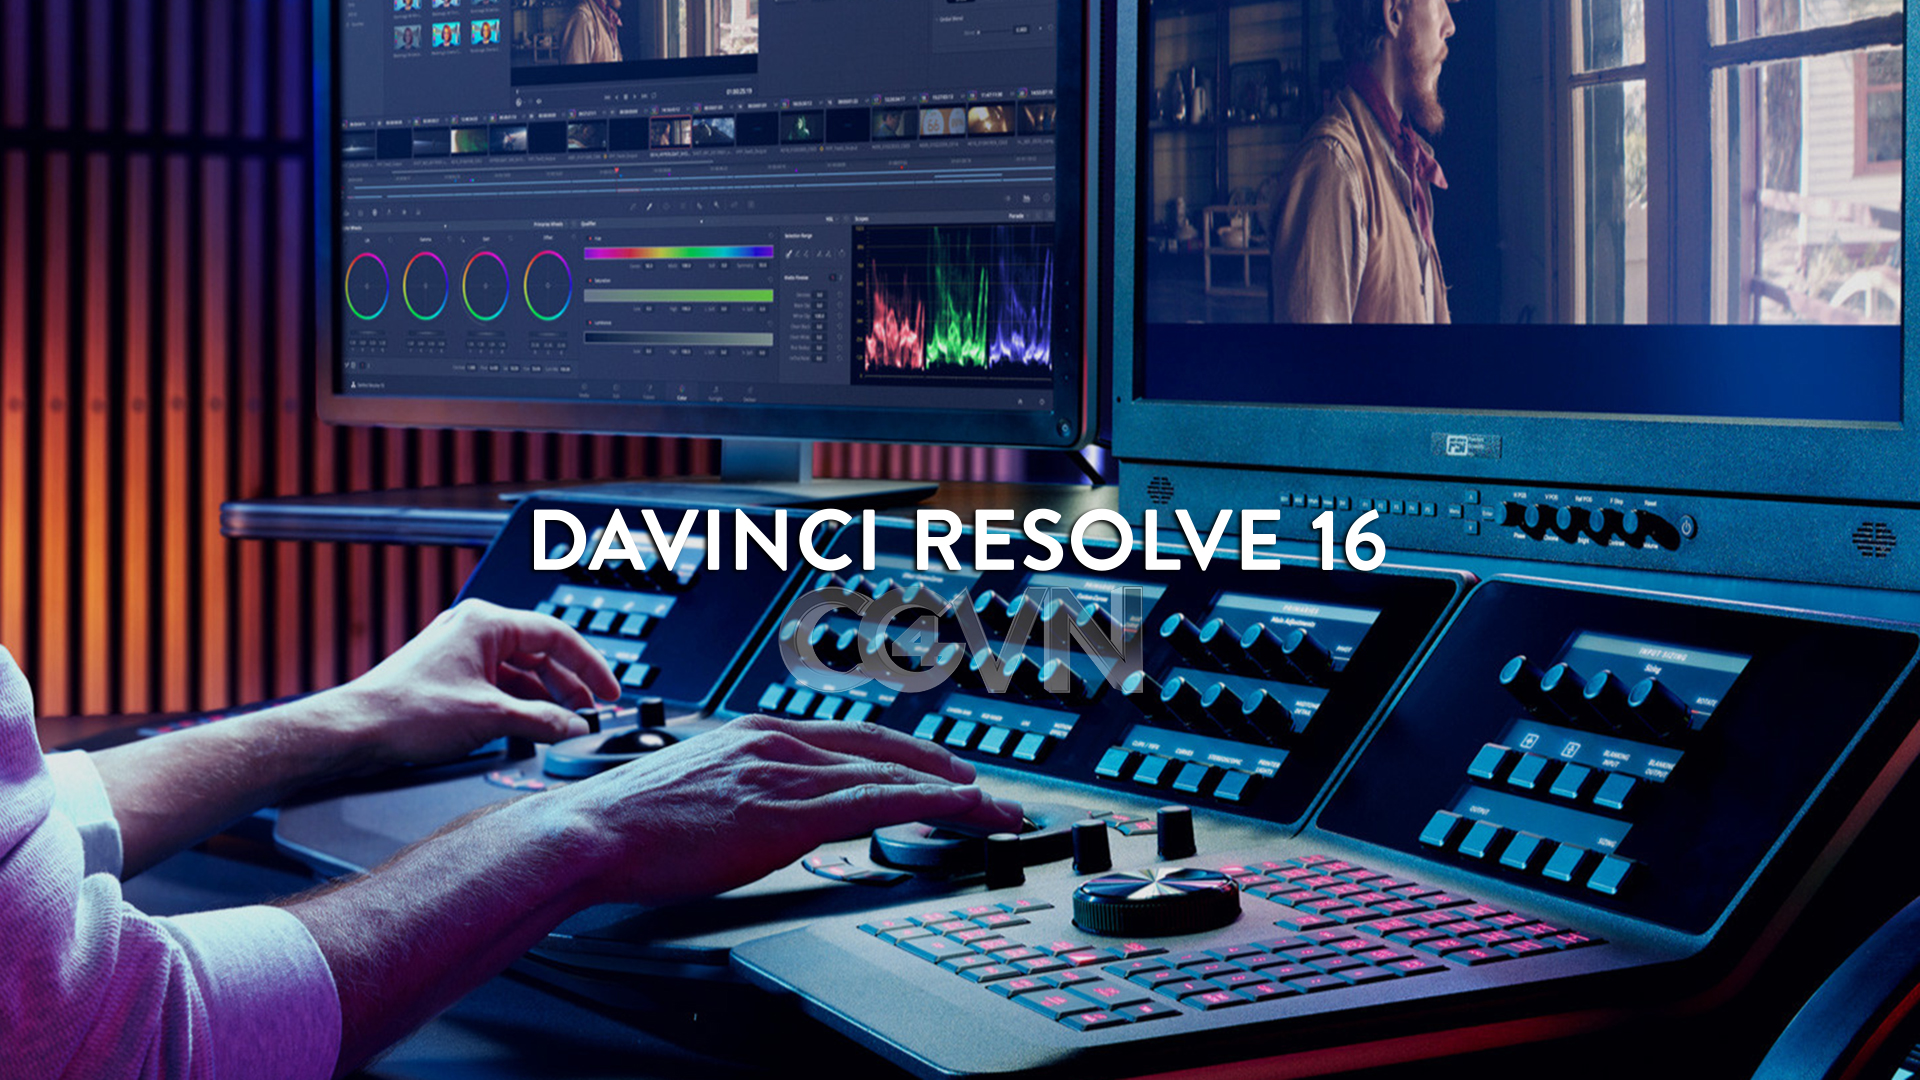 Davinci Resolve Studio 16.2.0.55 Activation Key Crack Download